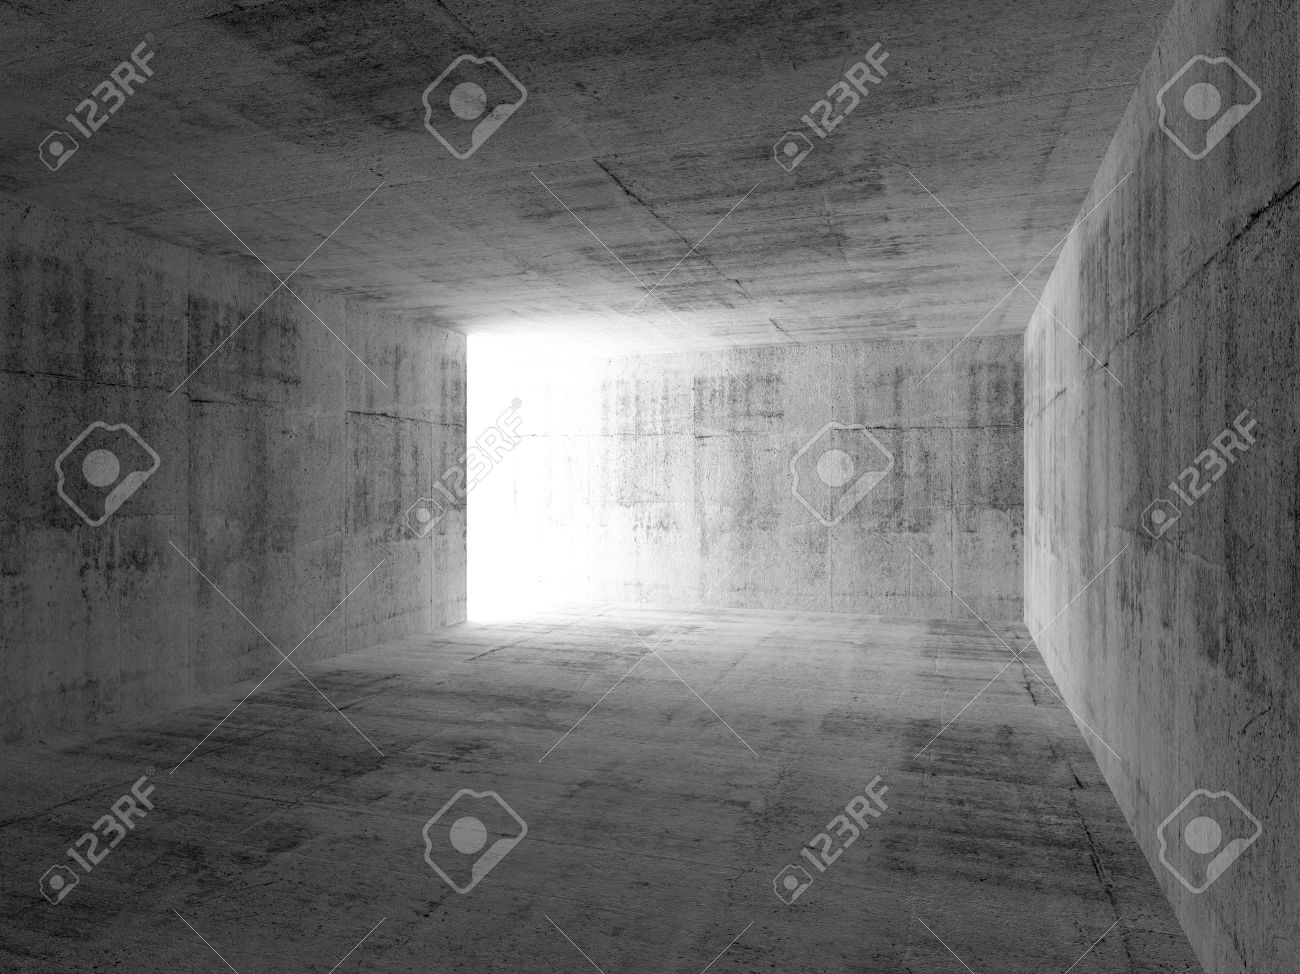 Interior Vacío Cuarto Oscuro Abstracto Con Muros De Hormigón Fotos ...